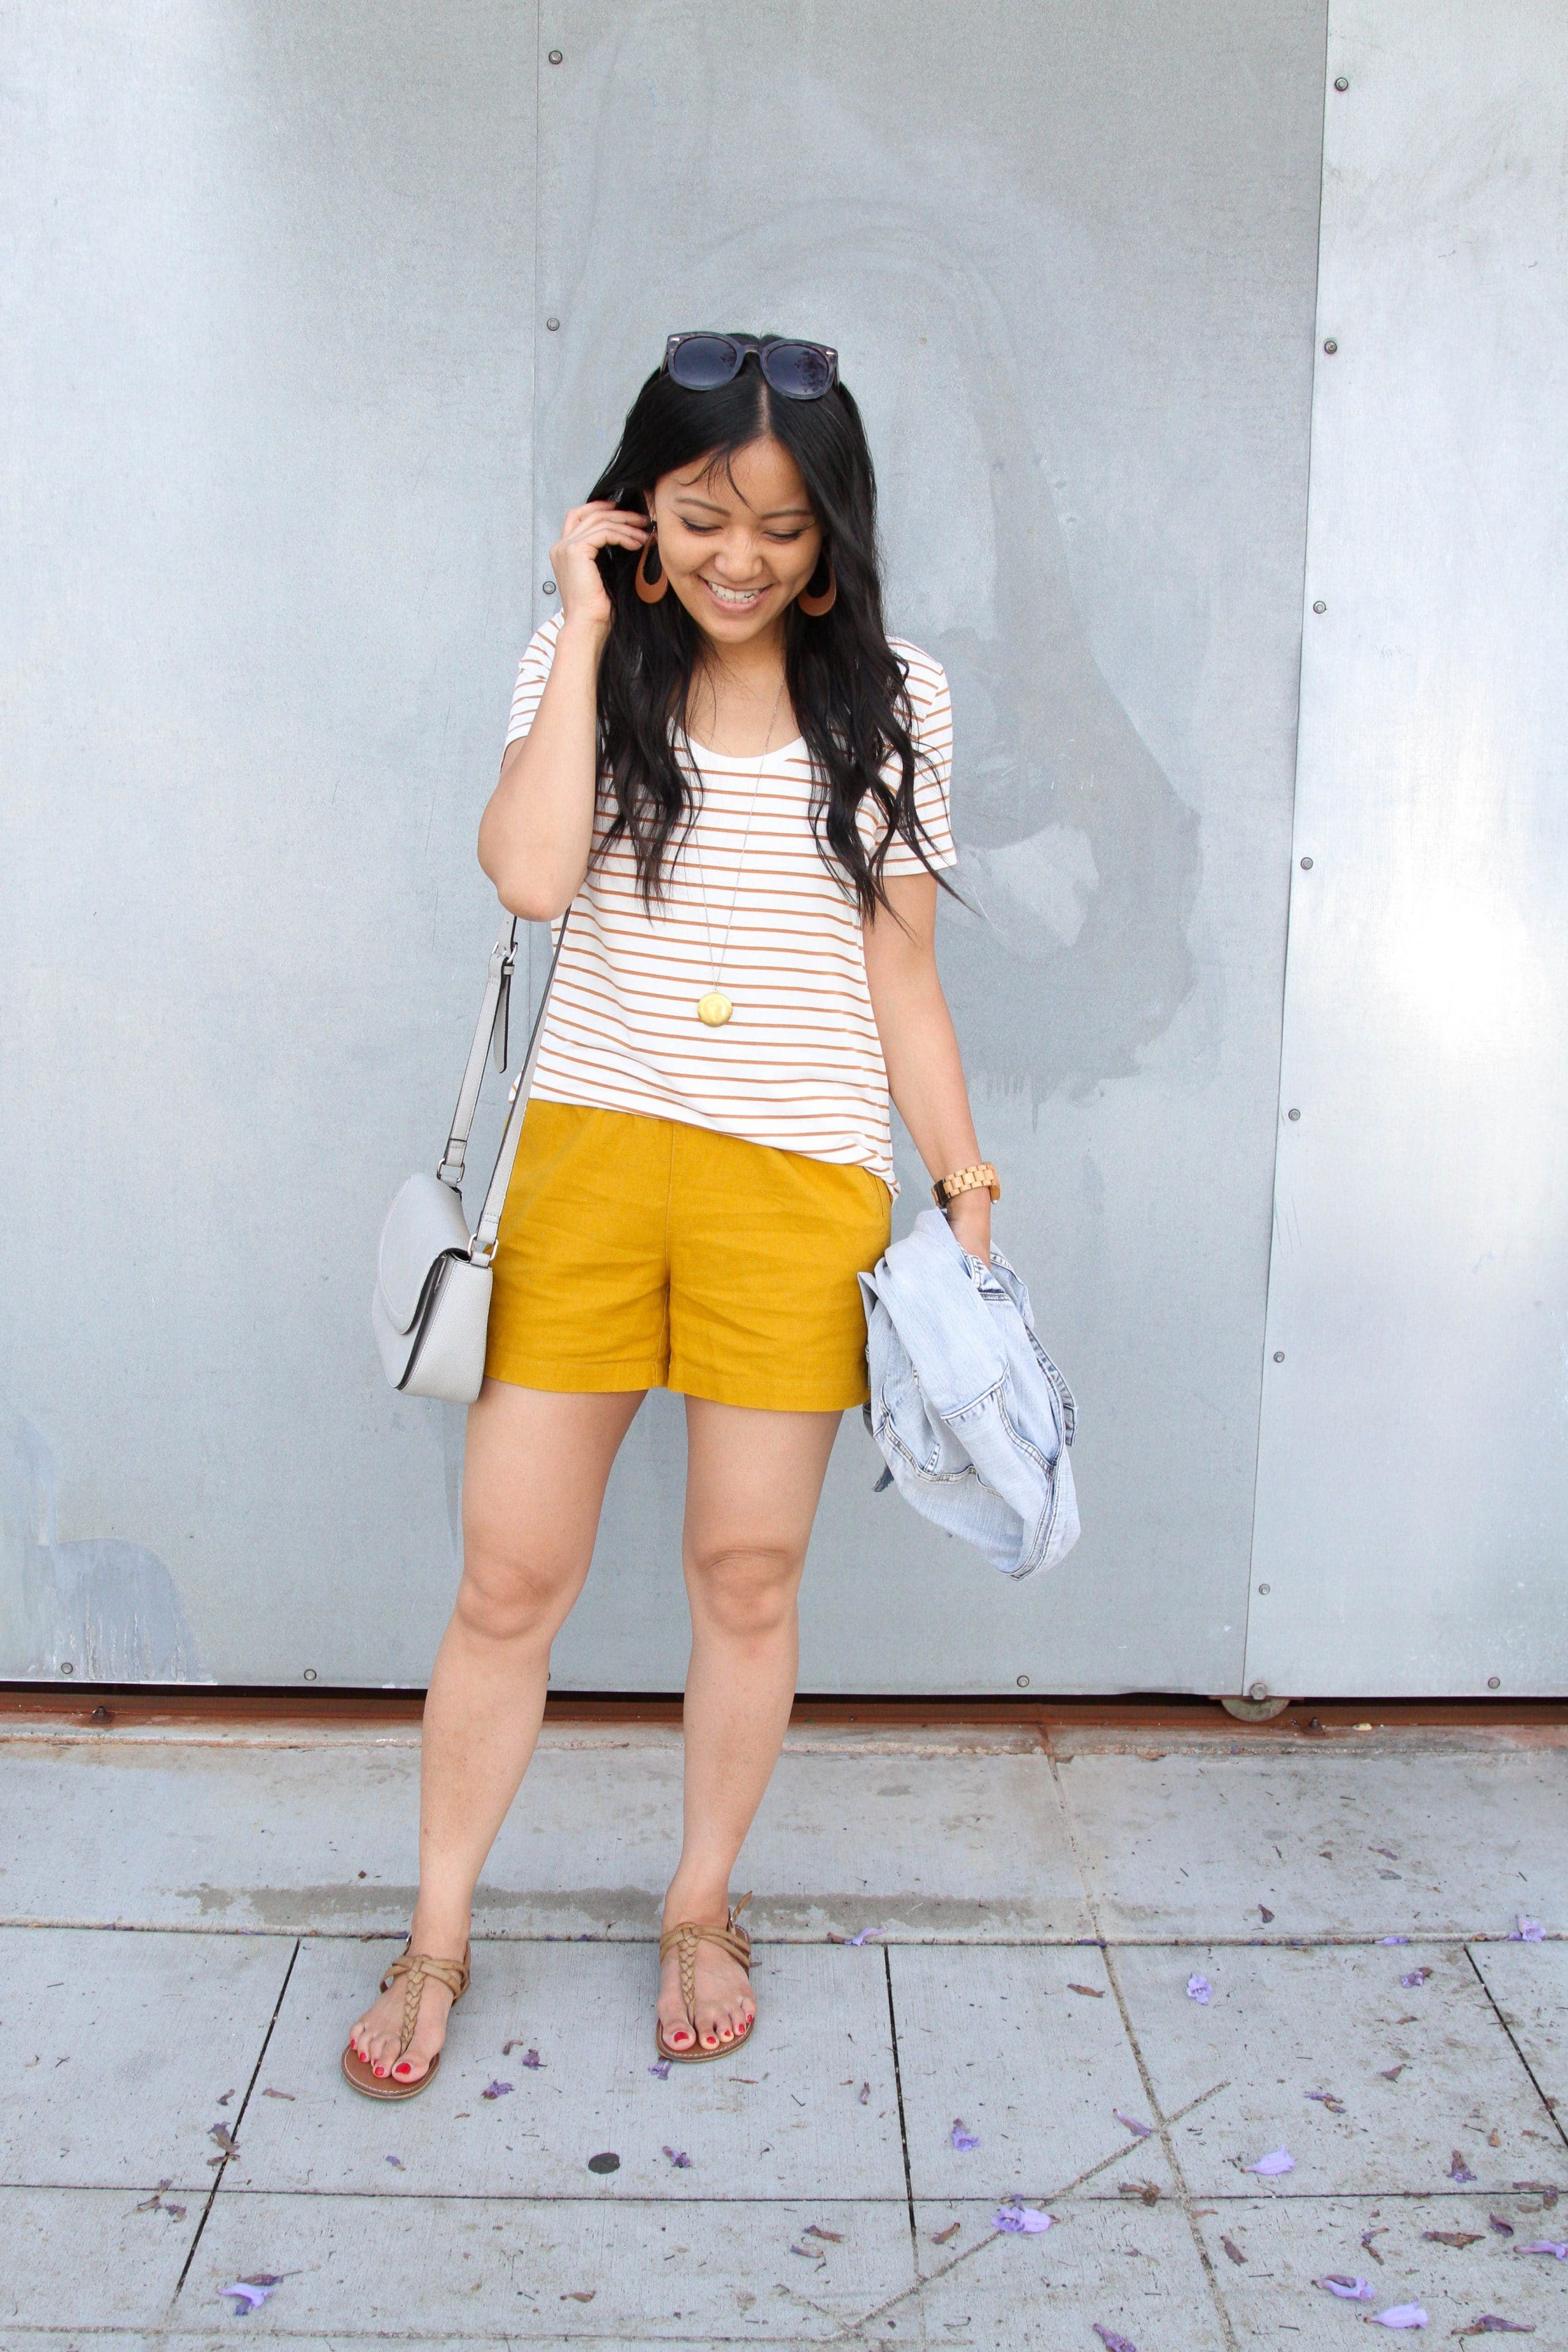 mustard shorts + striped tee + tan sandals + crossbody purse + denim jacket